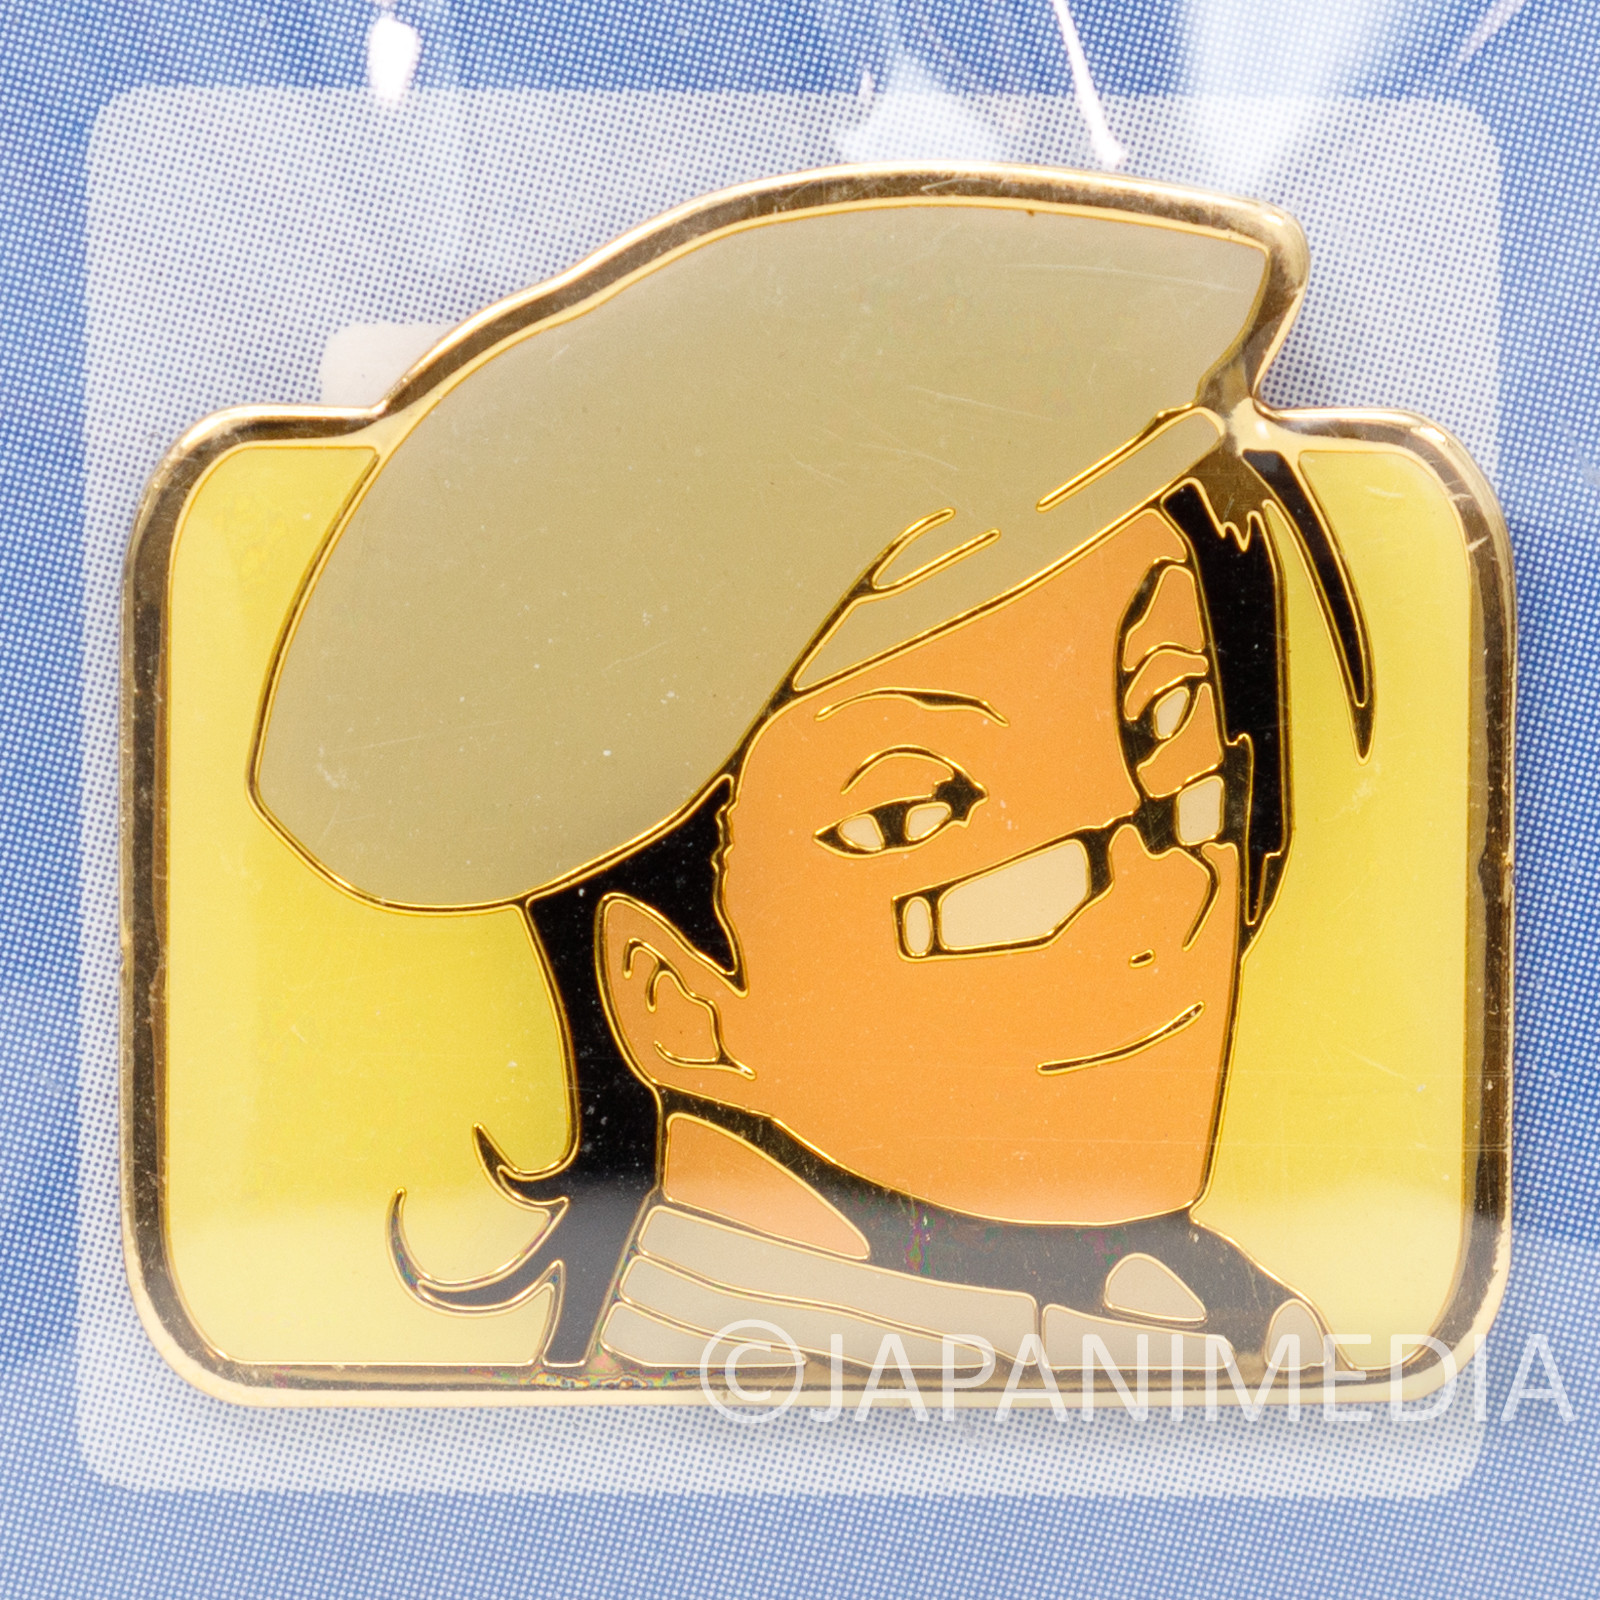 D.Gray-man Komui Lee Chief Officer Metal Pins JAPAN ANIME MANGA